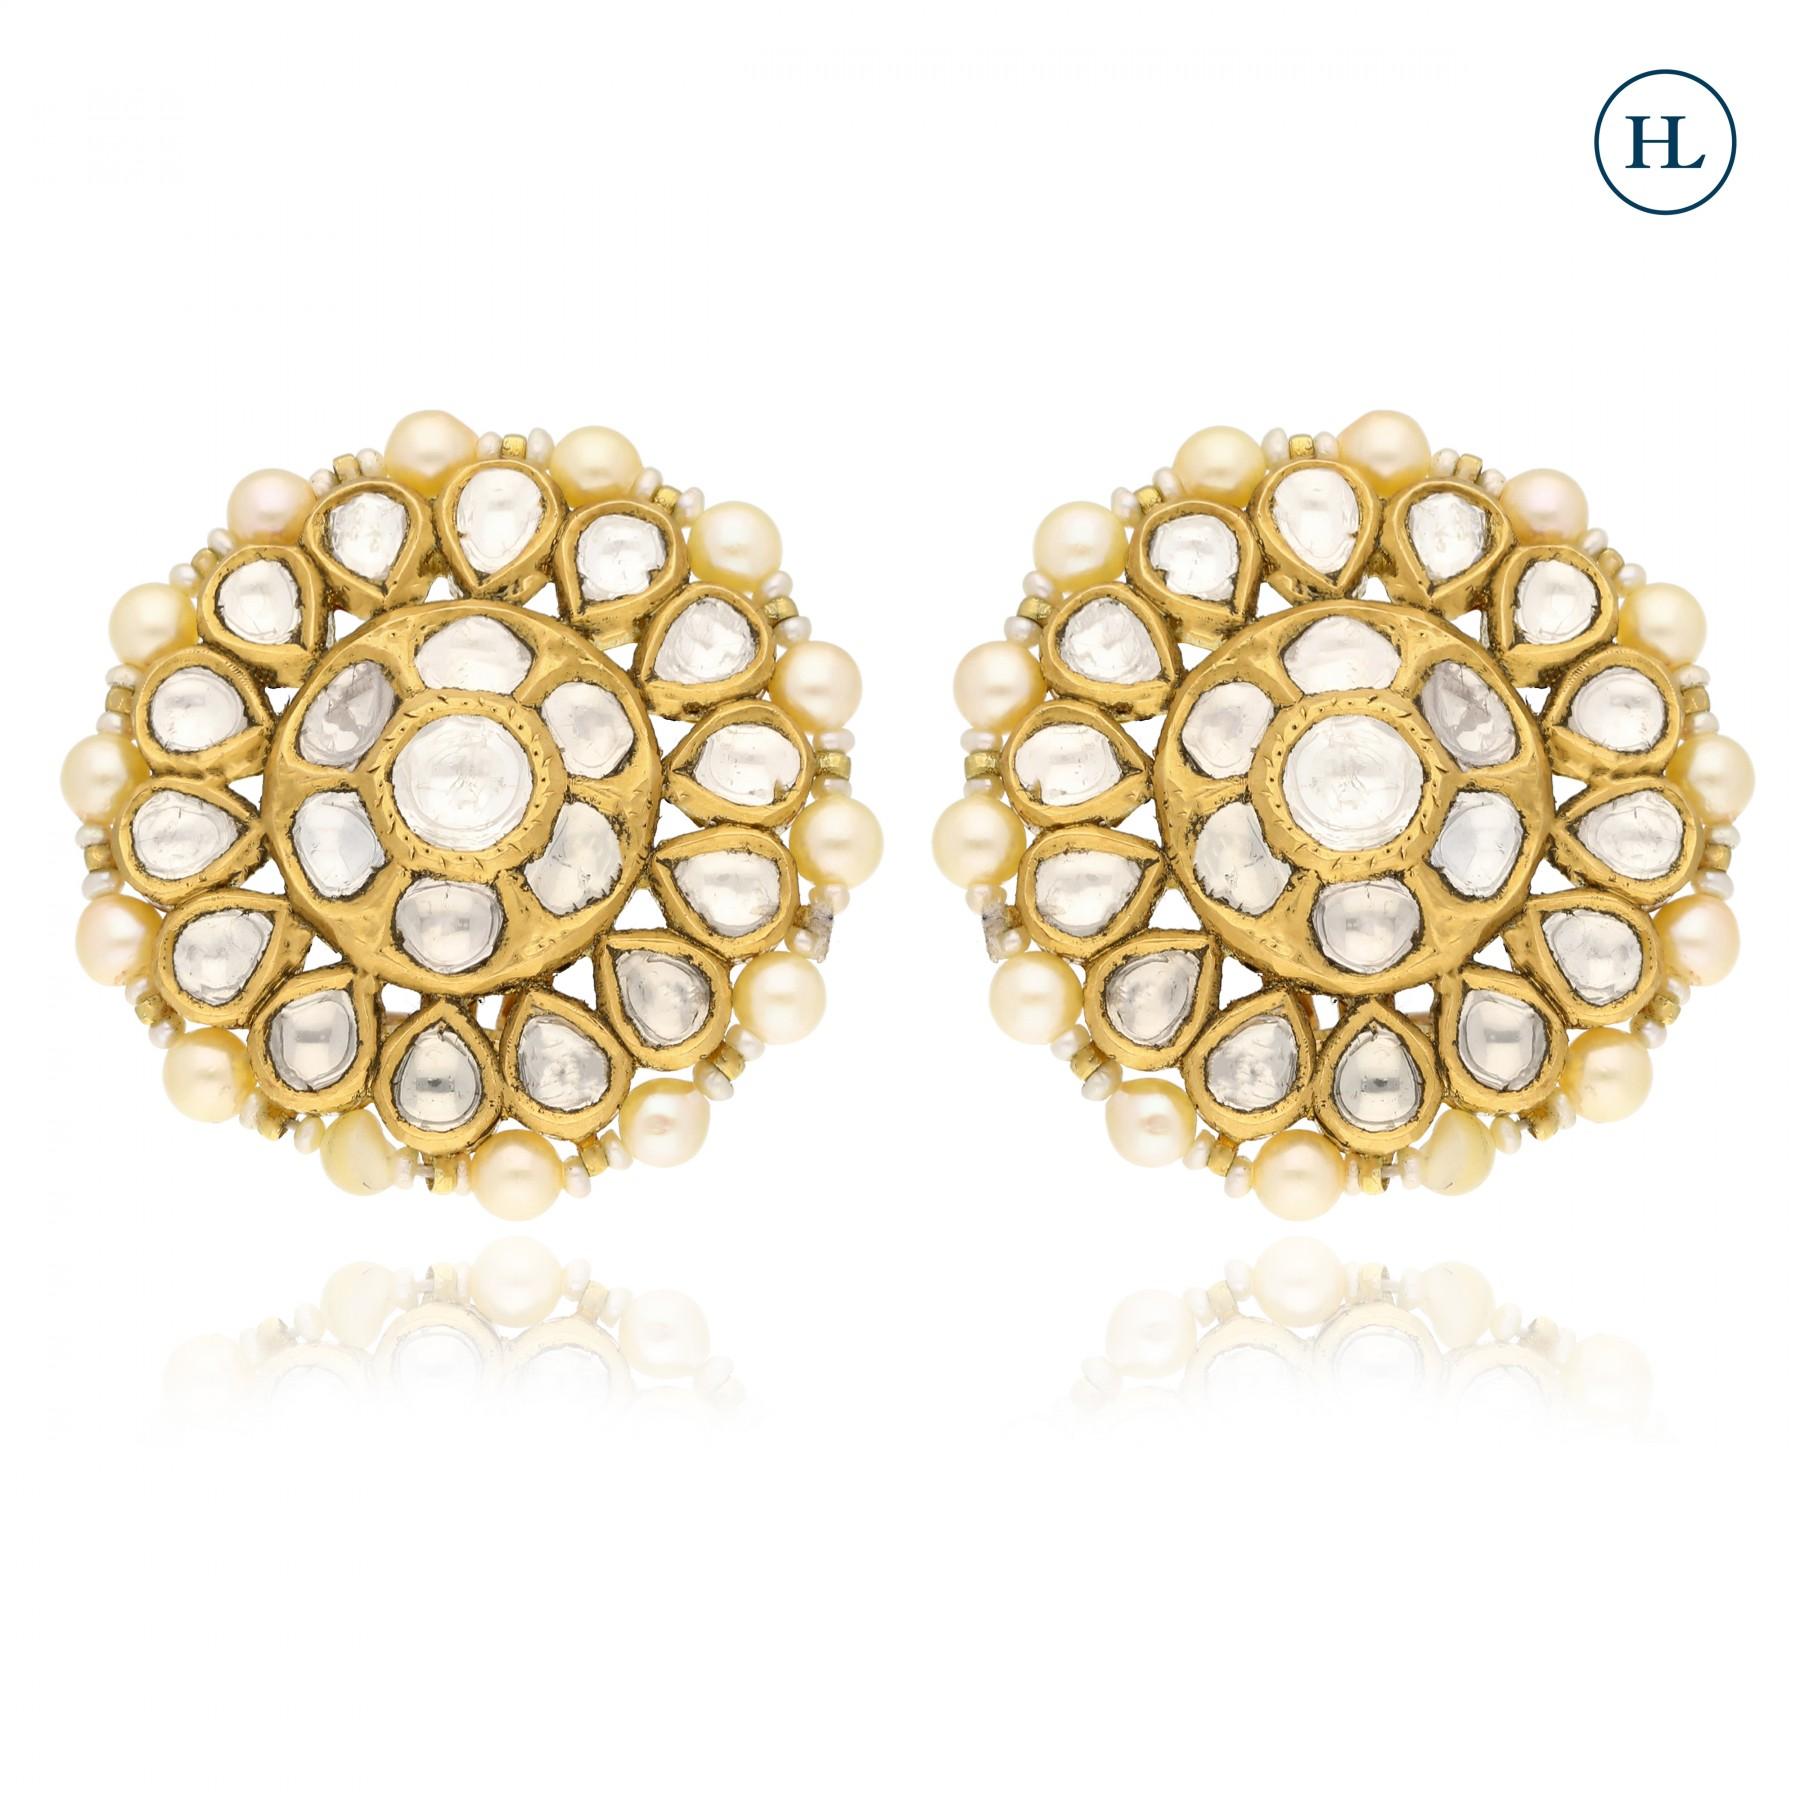 Antique-Styled Polki Earrings